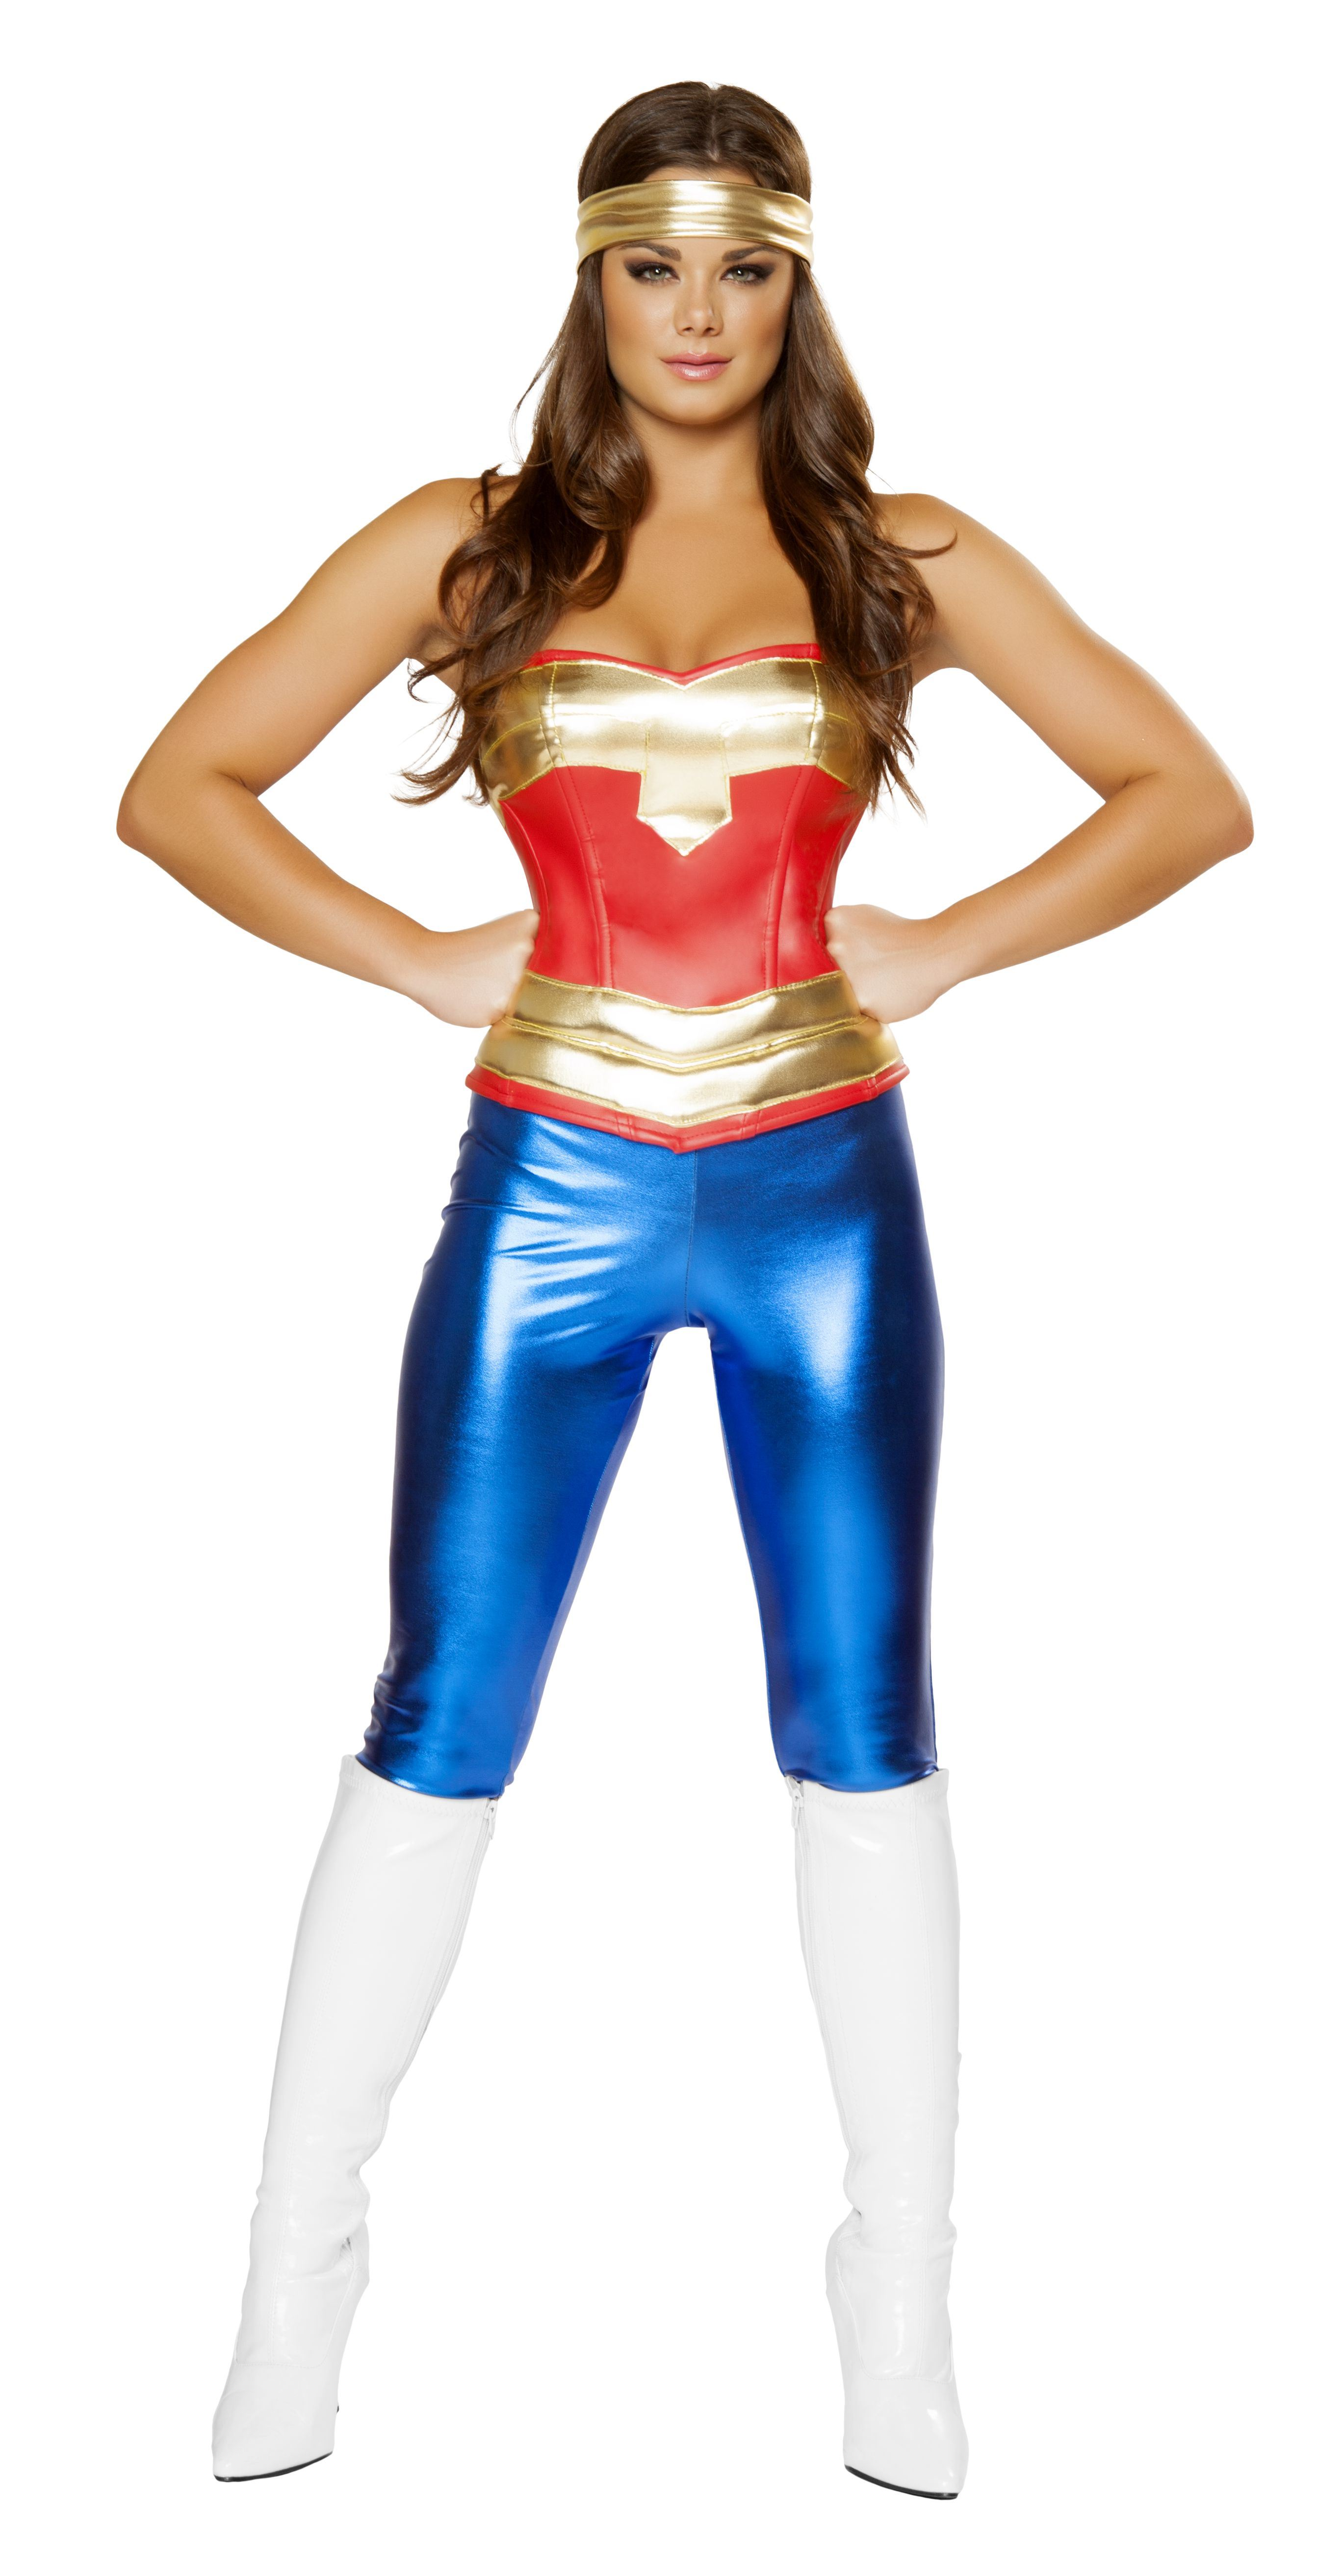 Adult Comic Cutie Woman Super Hero Costume 7599 The